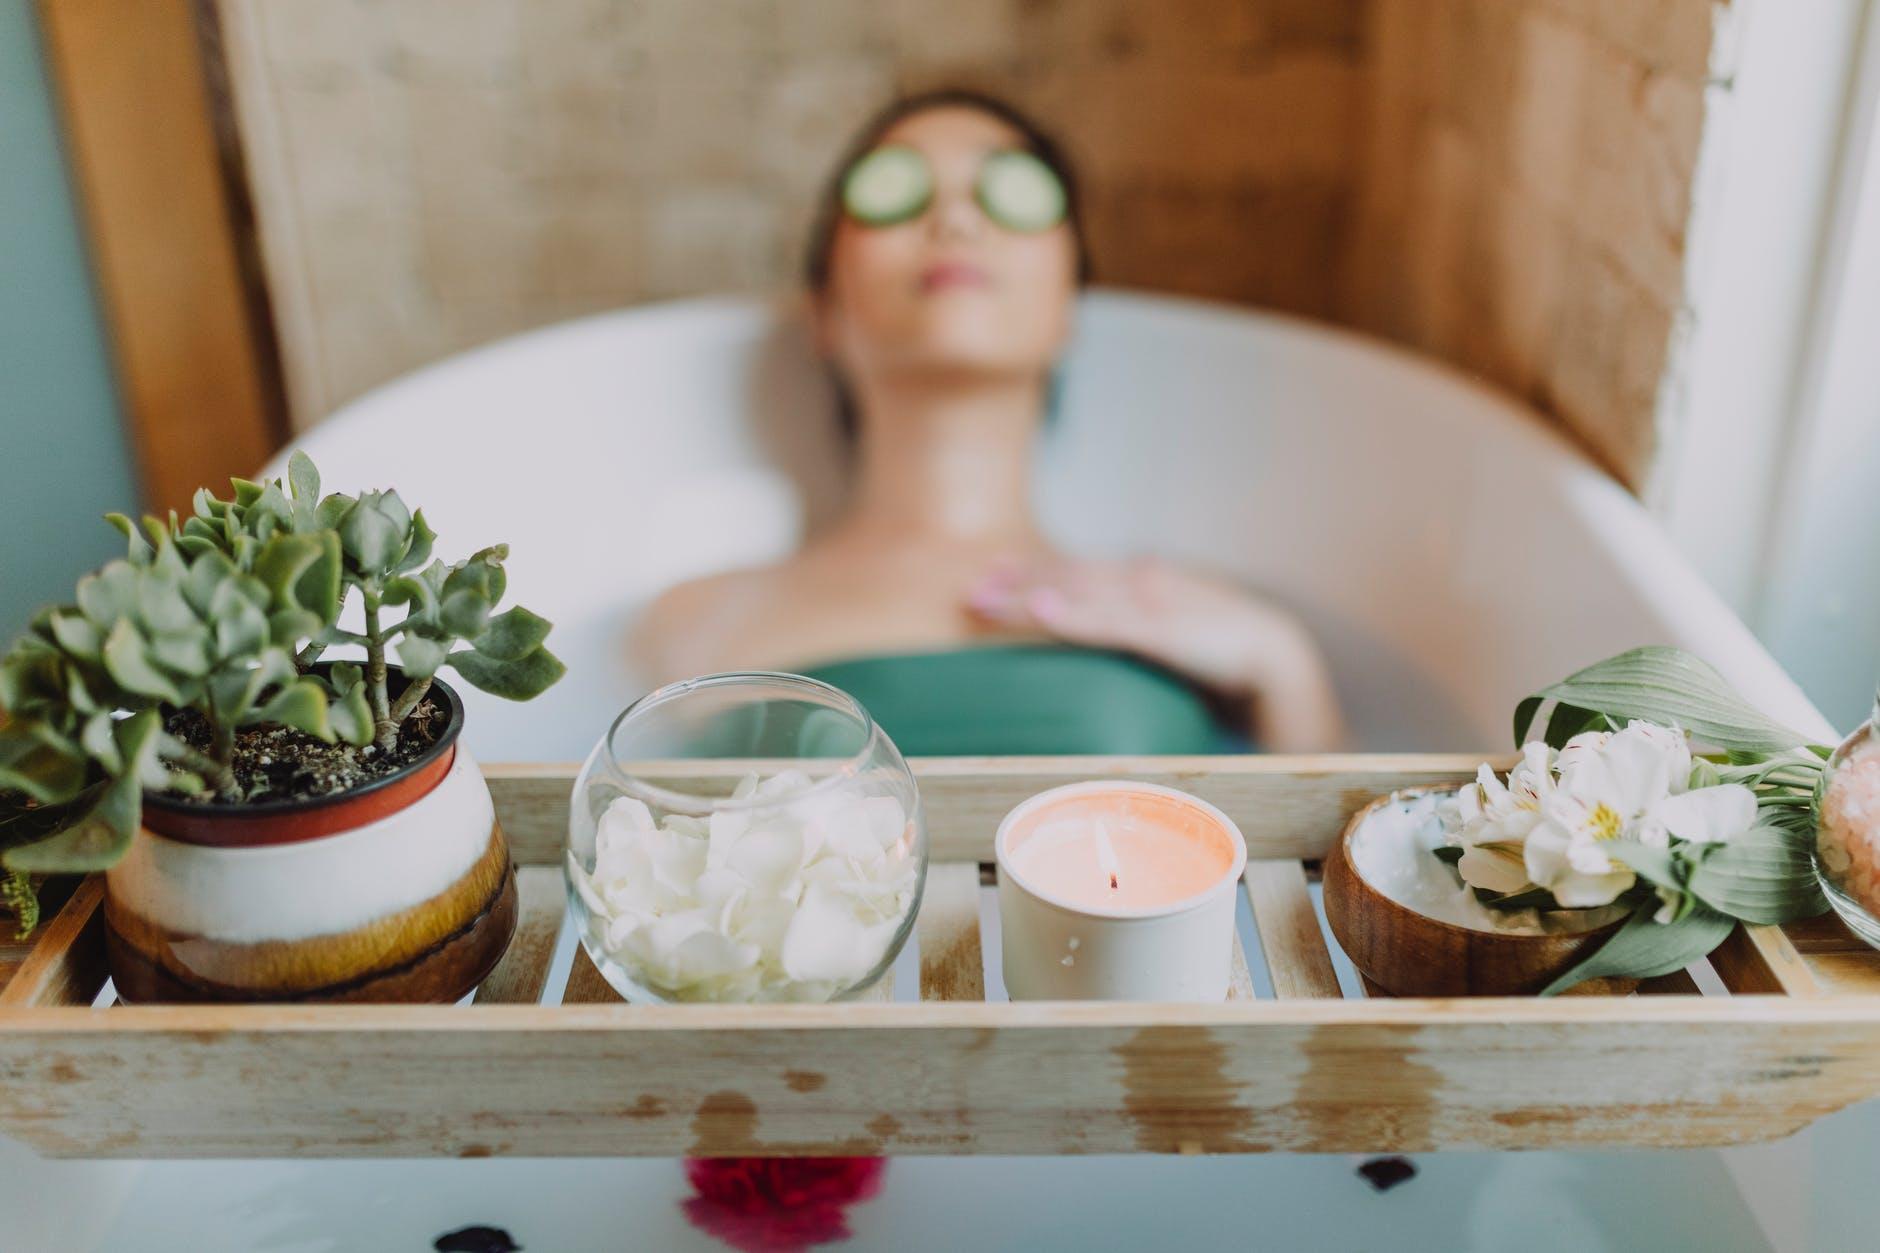 woman relaxing in bath tub